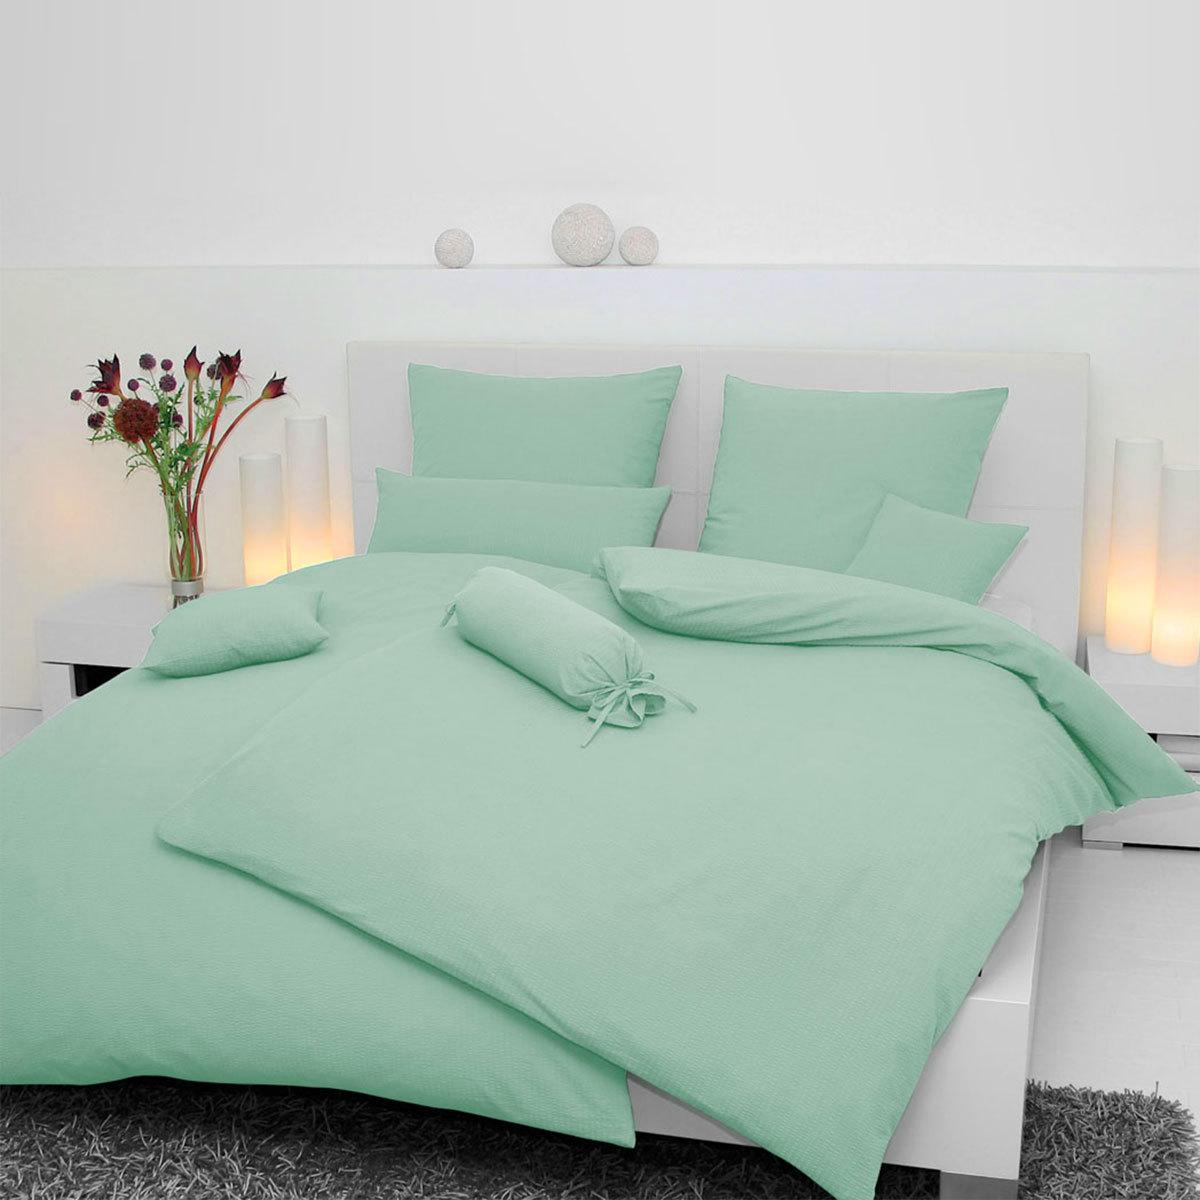 janine mako soft seersucker bettw sche piano hellgr n g nstig online kaufen bei bettwaren shop. Black Bedroom Furniture Sets. Home Design Ideas